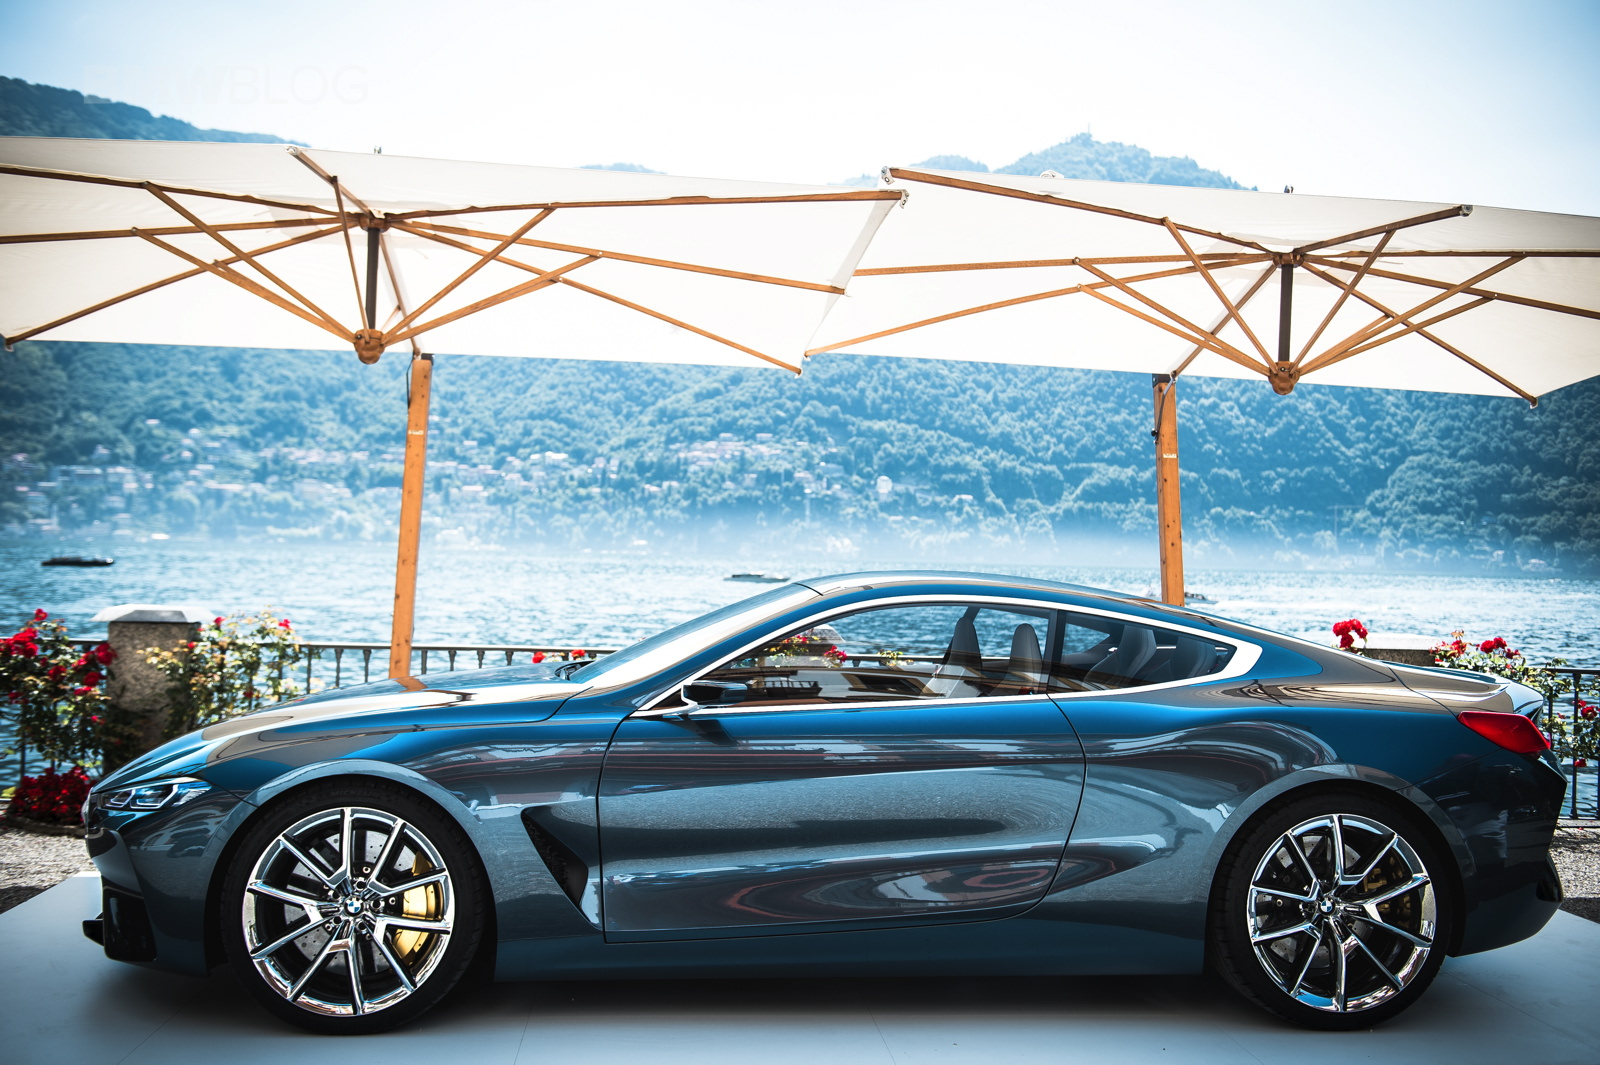 BMW Concept 8 Series Villa deste 2017 60